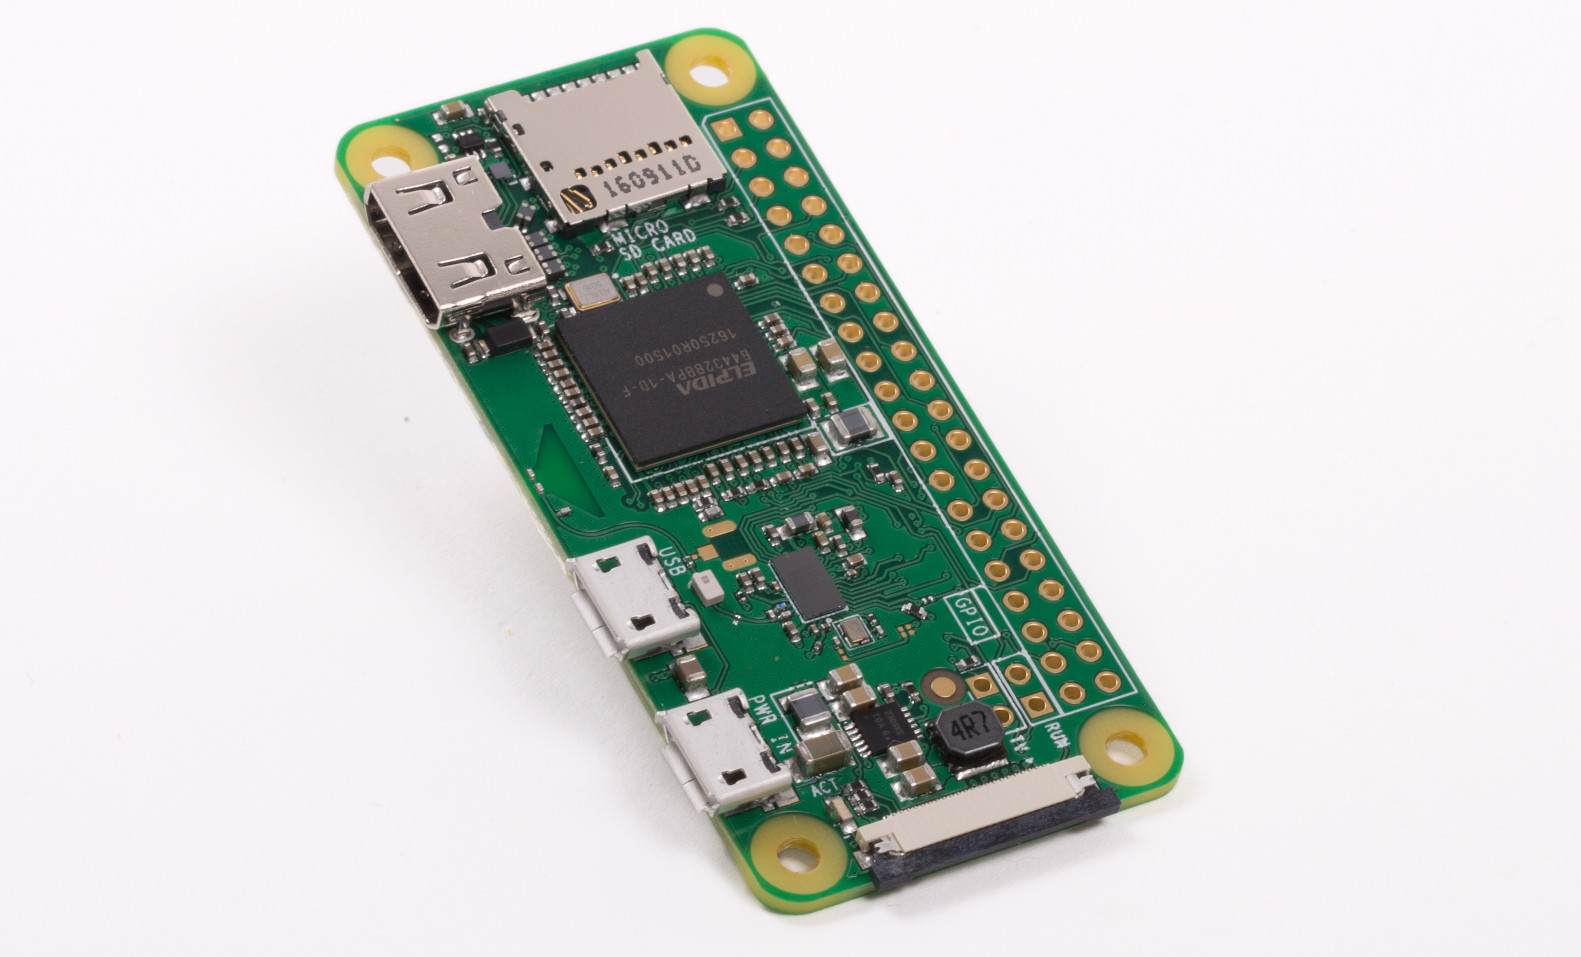 Raspberry Pi Zero W Mit Wlan Wifi Und Bluetooth Paket 3 Model B Quelle Raspberrypiorg